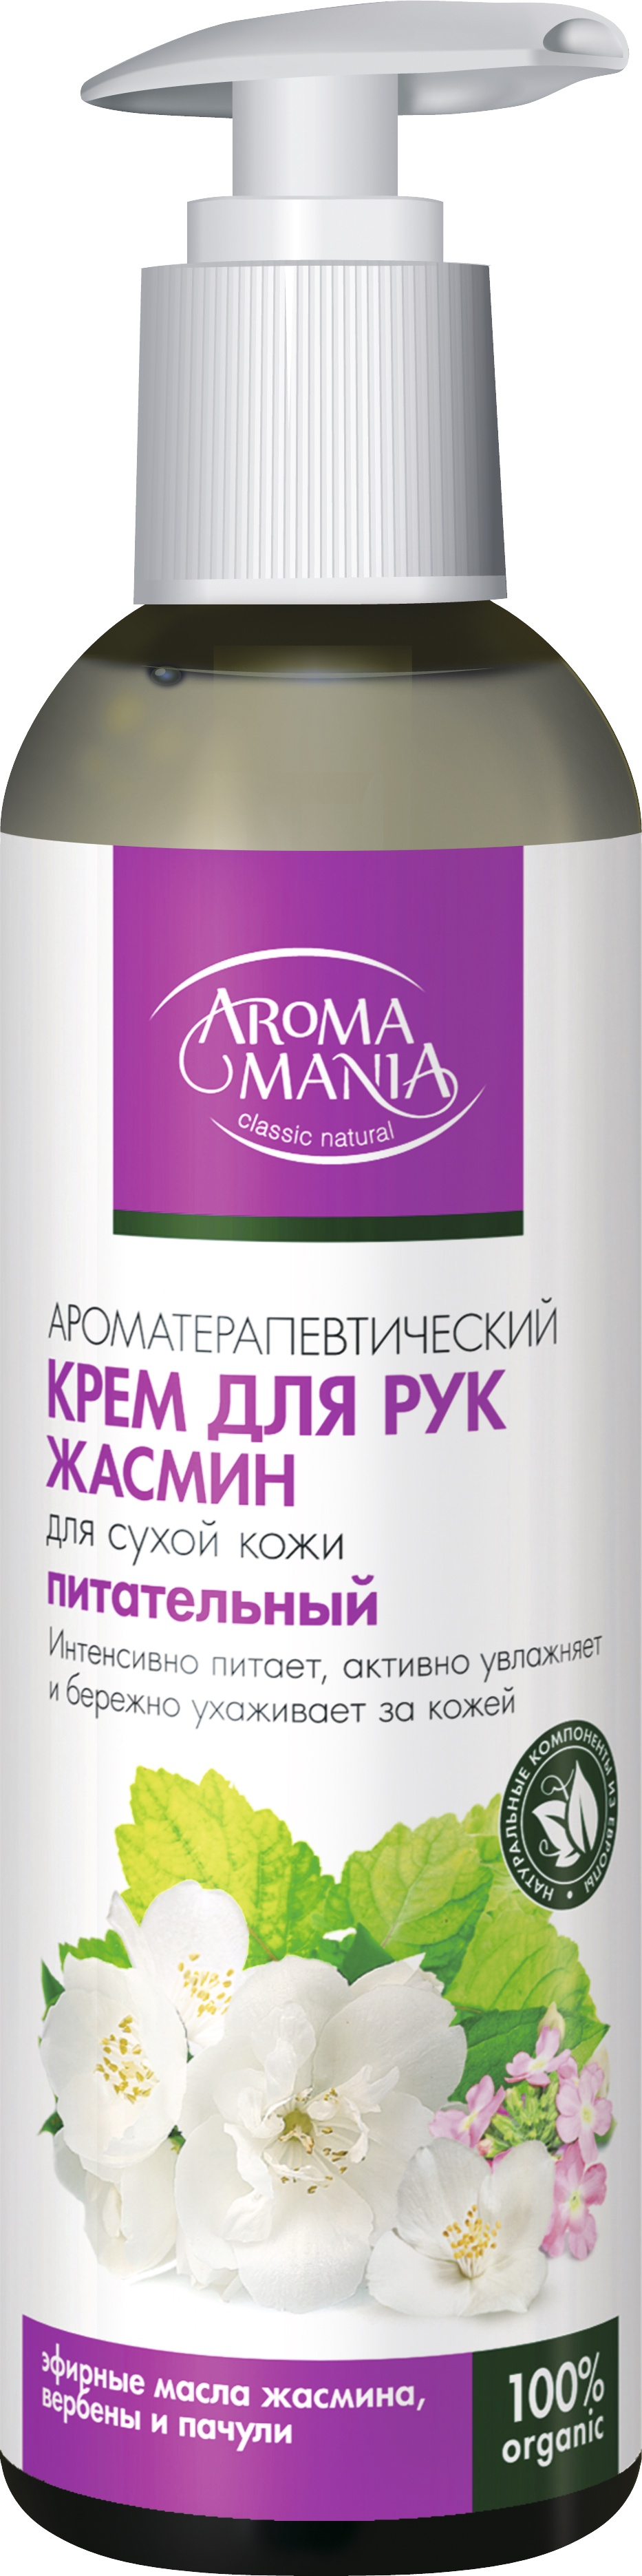 Крем для рук ЖАСМИН AROMA MANIA 250 мл eldan крем для рук с прополисом 250 мл